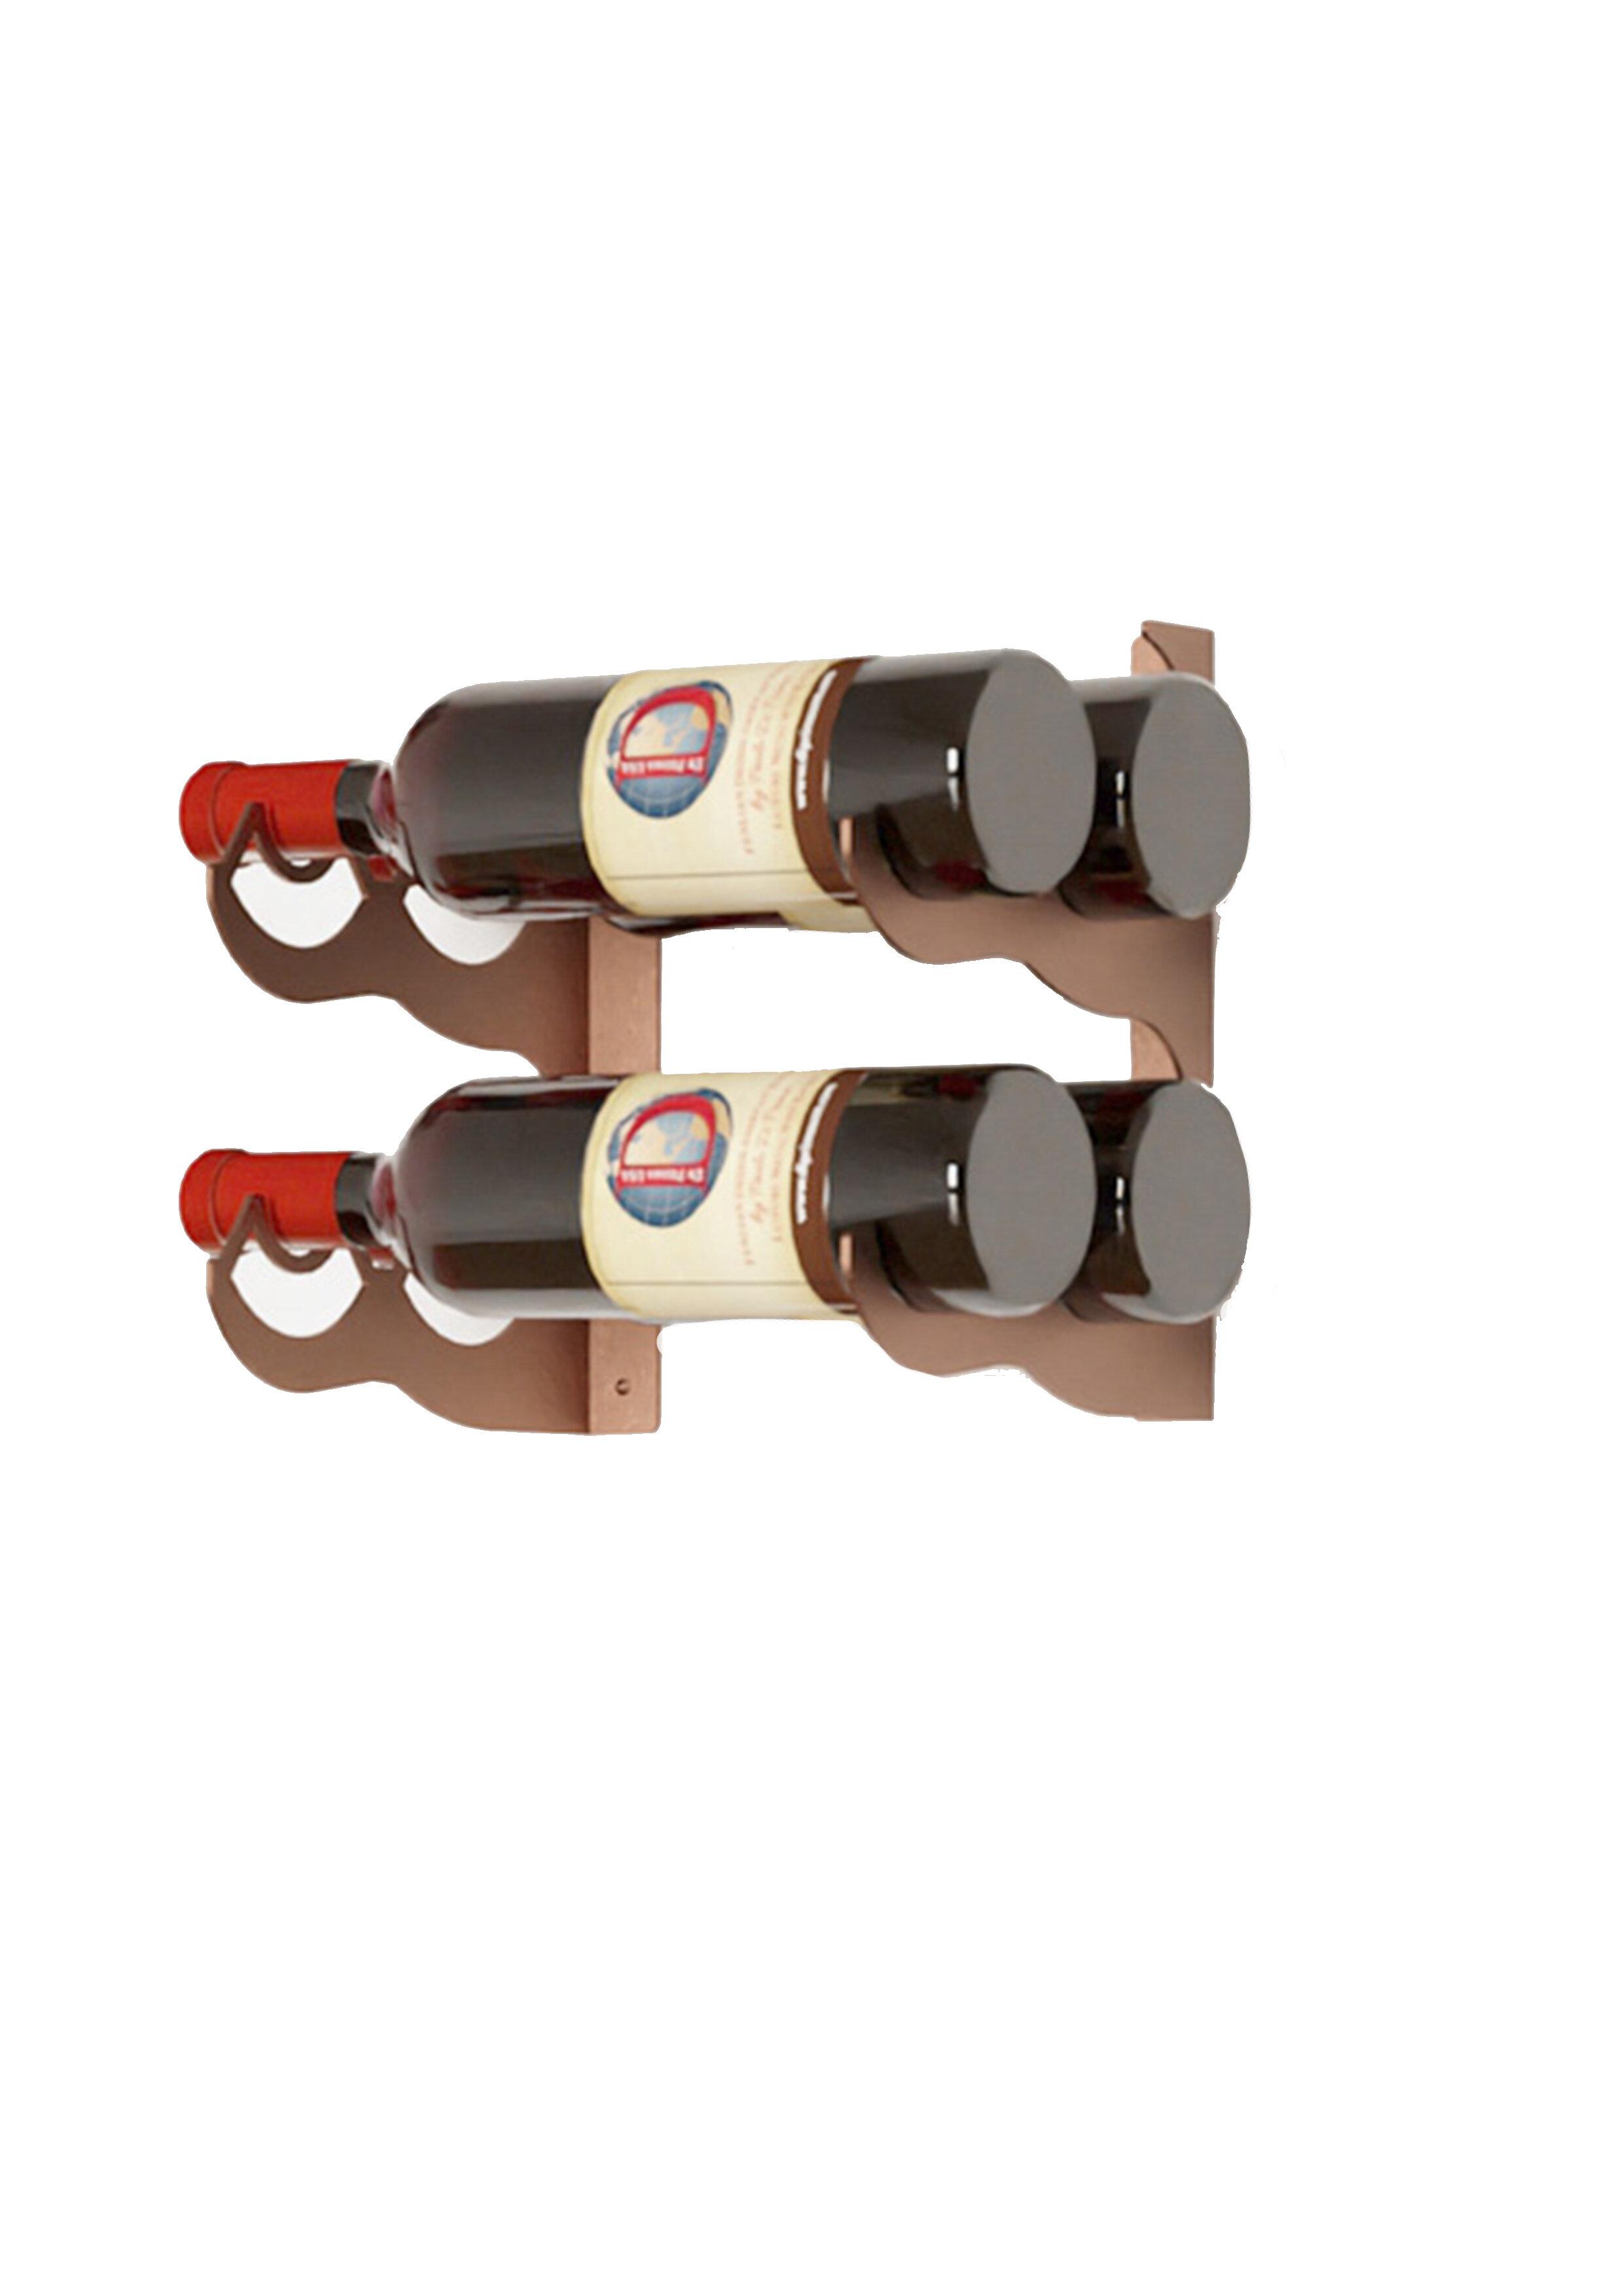 Ebern Designs Dundridge 4 Bottle Wall Mounted Wine Bottle Rack In Corten Wayfair